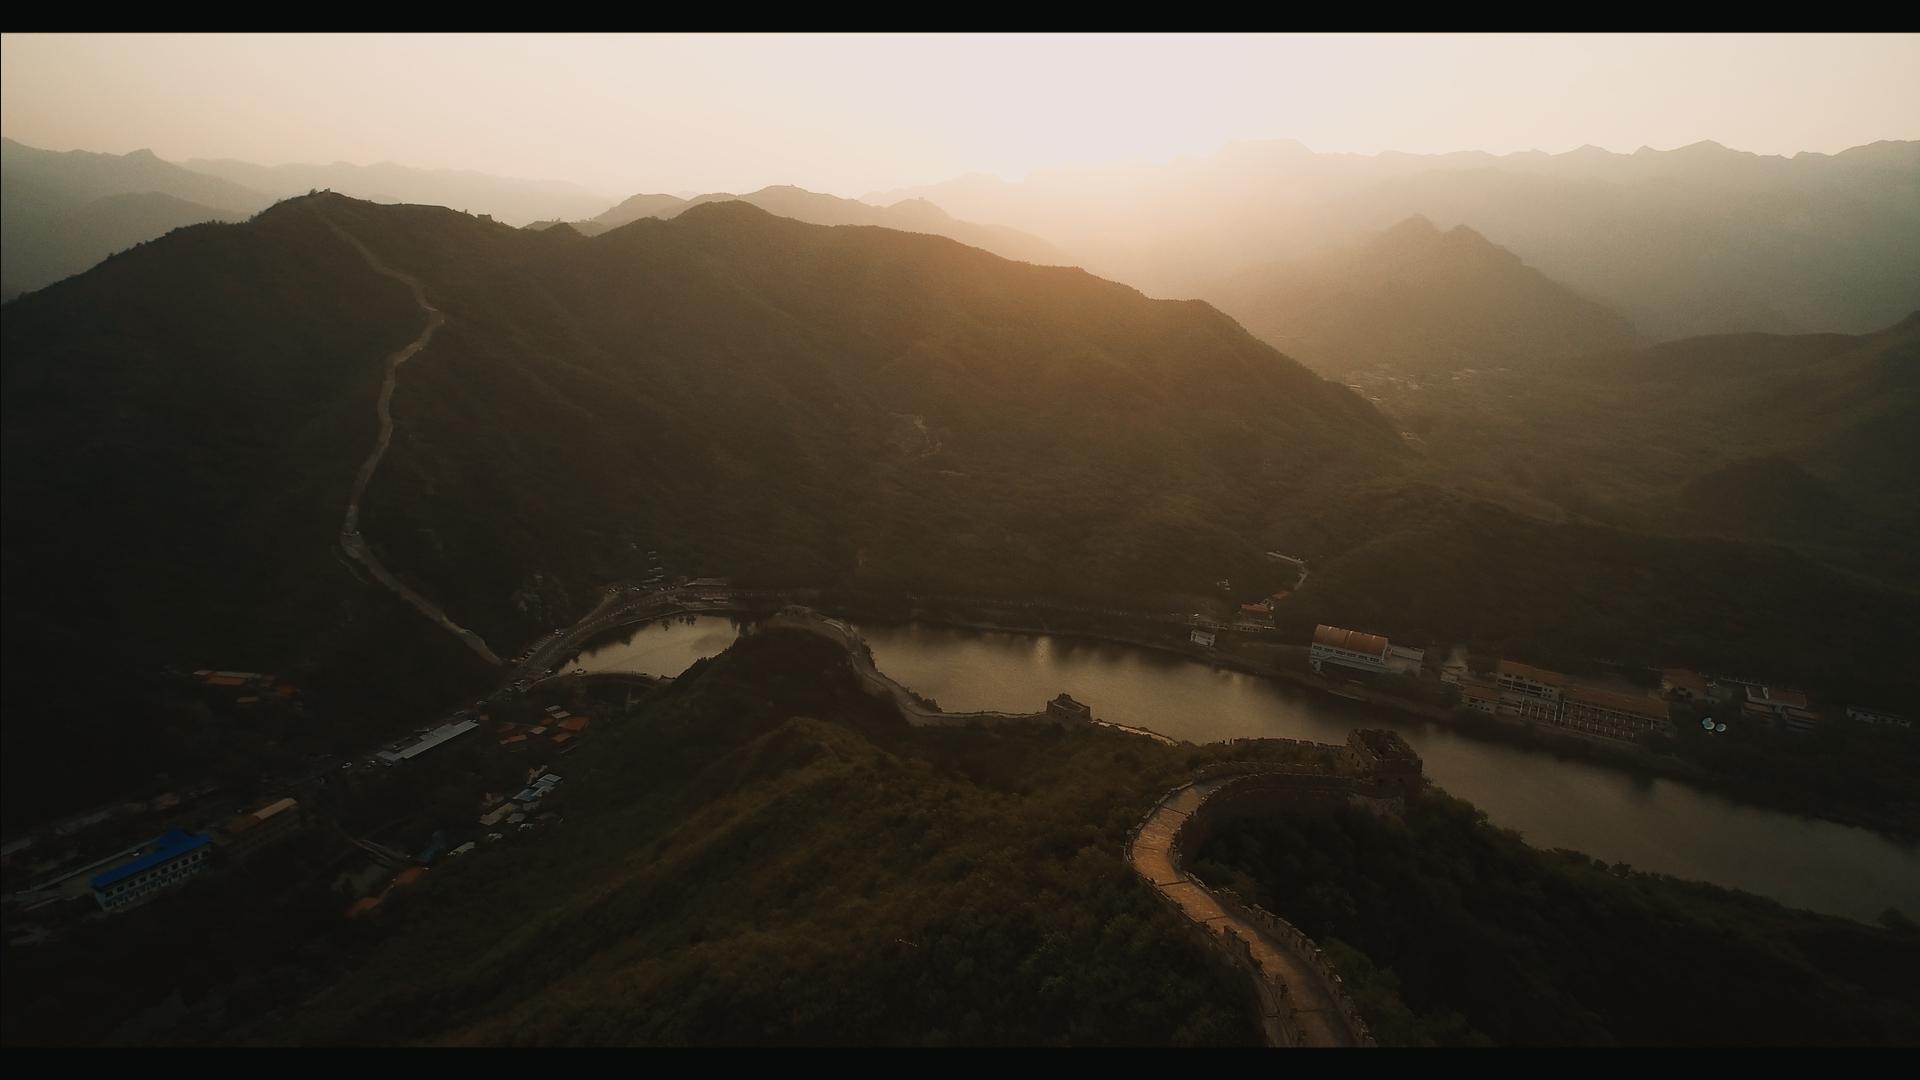 Yuyi_1.2.2.jpg